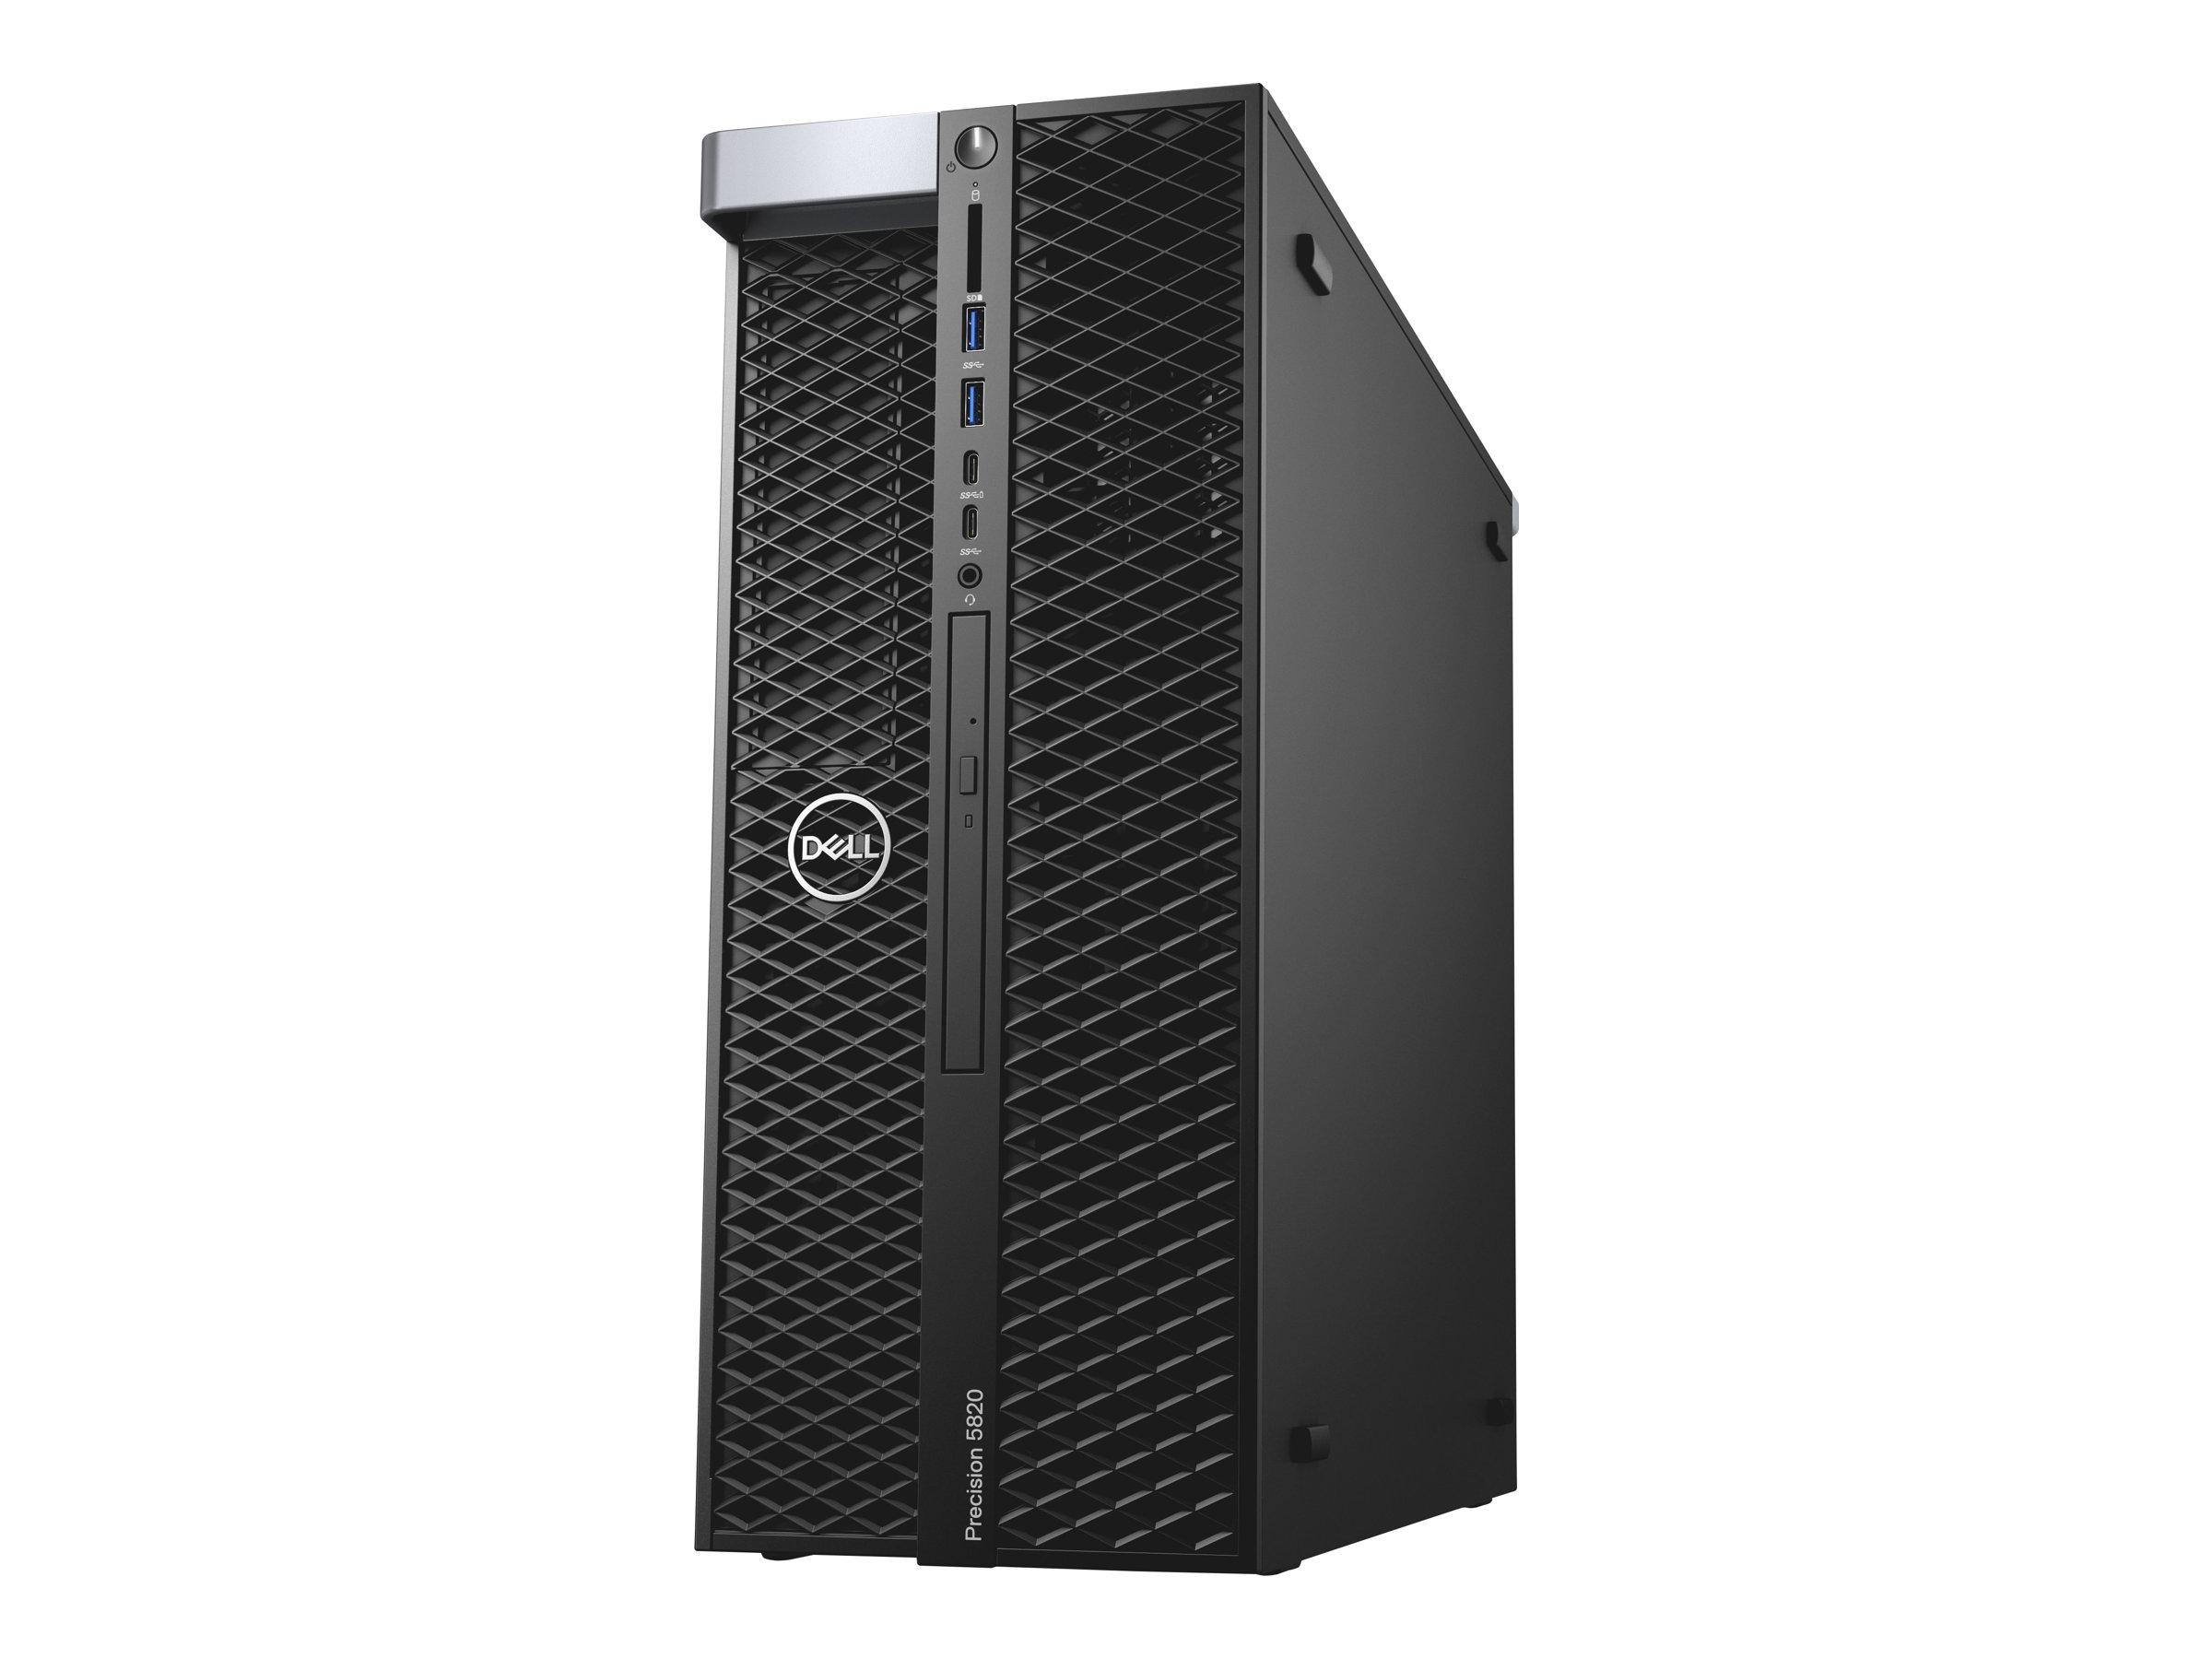 Dell Precision 5820 Tower - MDT - 1 x Core i9 9920X X-series / 3.5 GHz - RAM 16 GB - SSD 512 GB - DVD-Writer